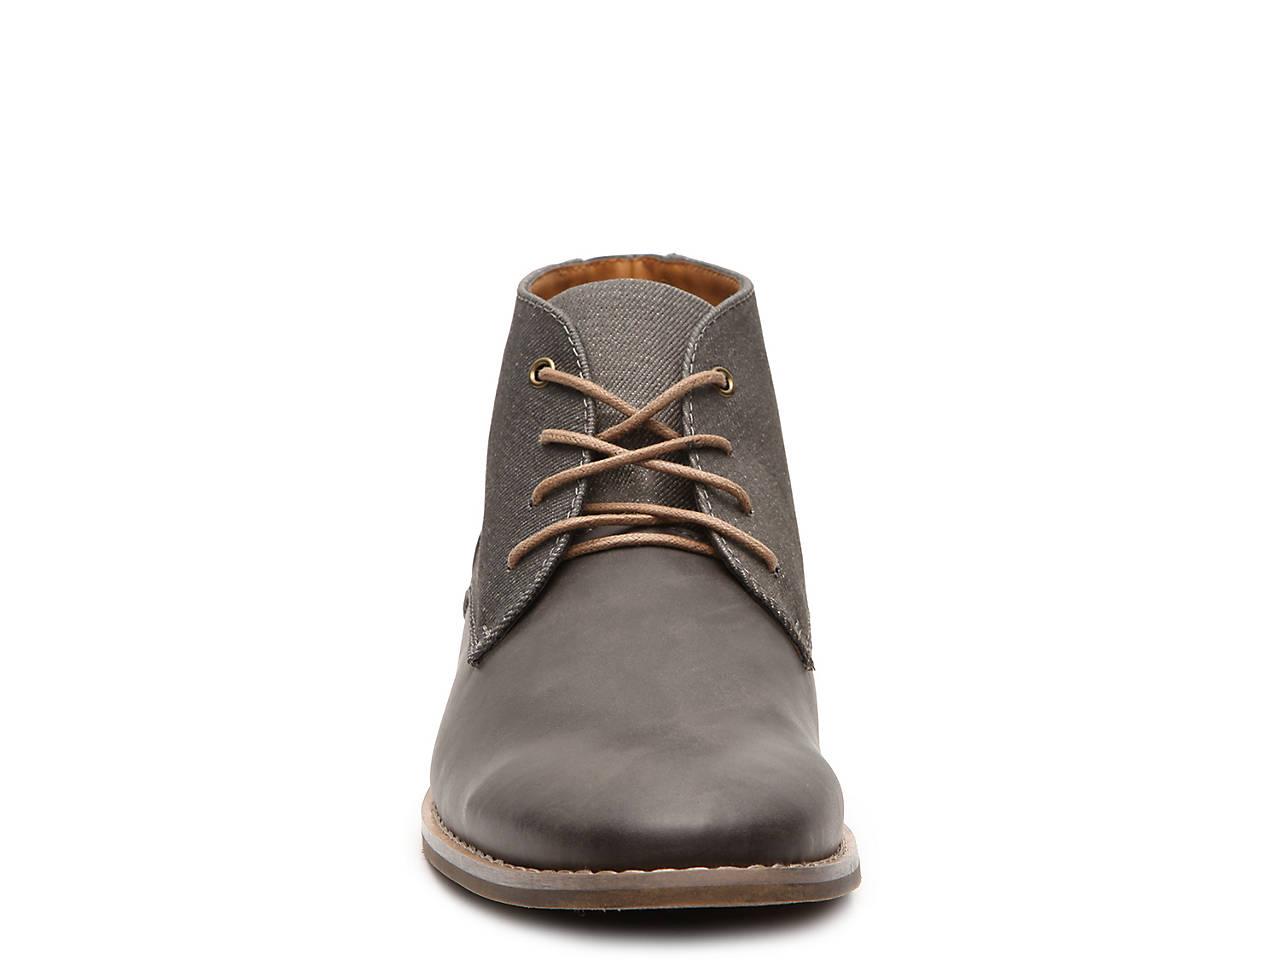 78acbf4ff0a Ruben Chukka Boot